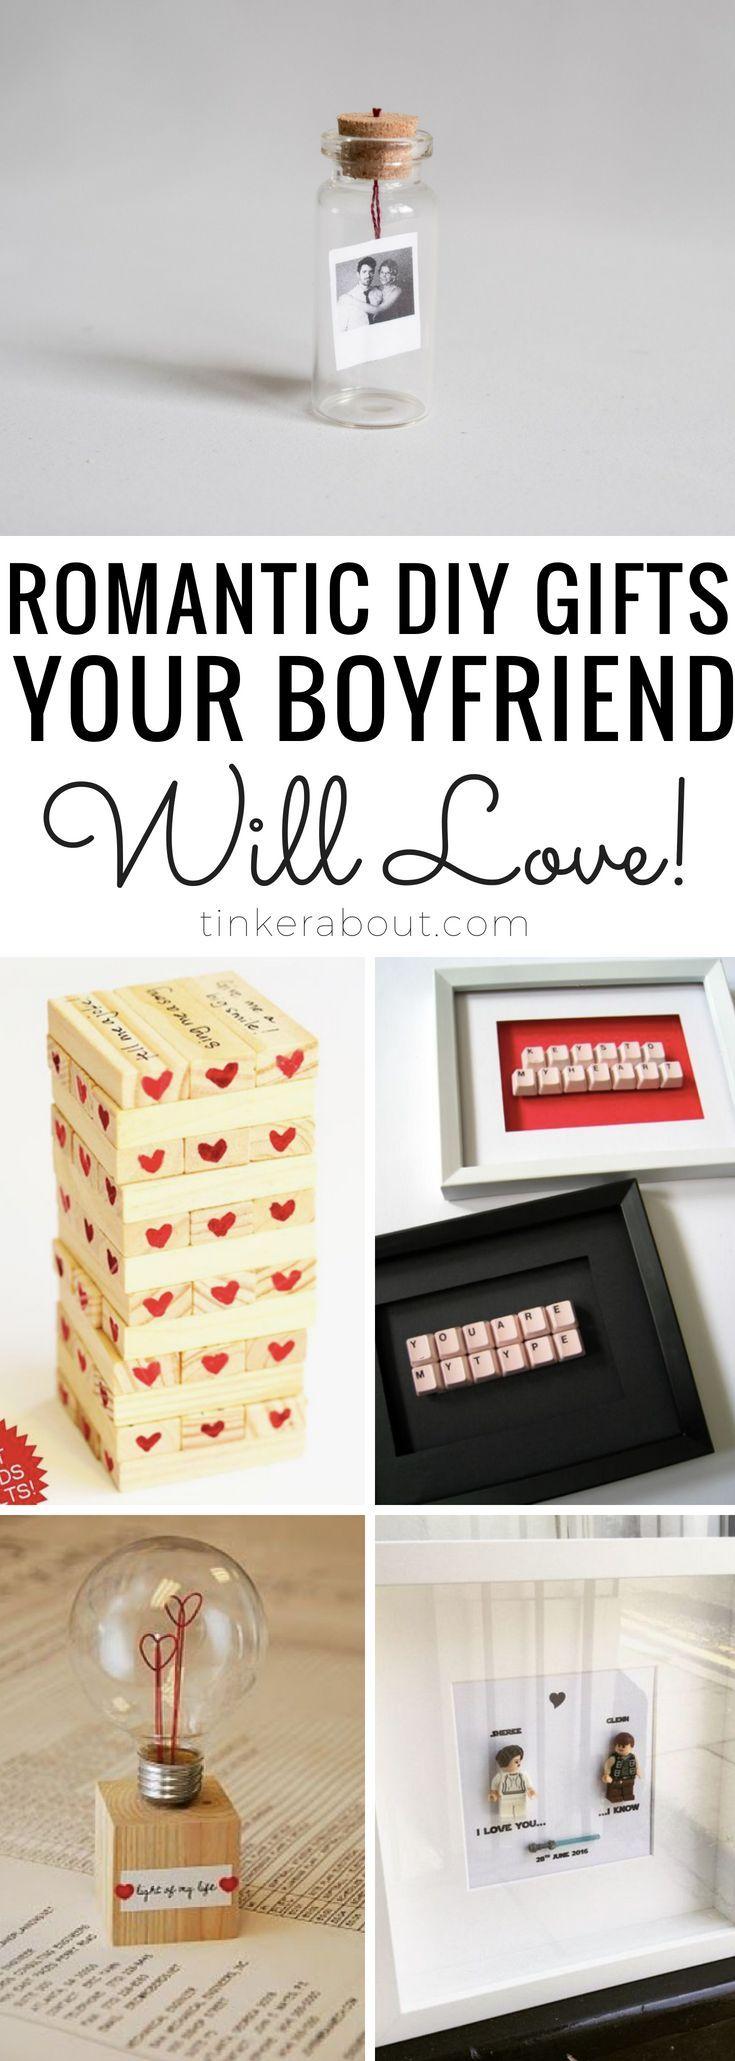 17 DIY Gifts For Boyfriends (Ideal For Anniversaries & Valentine's Day)